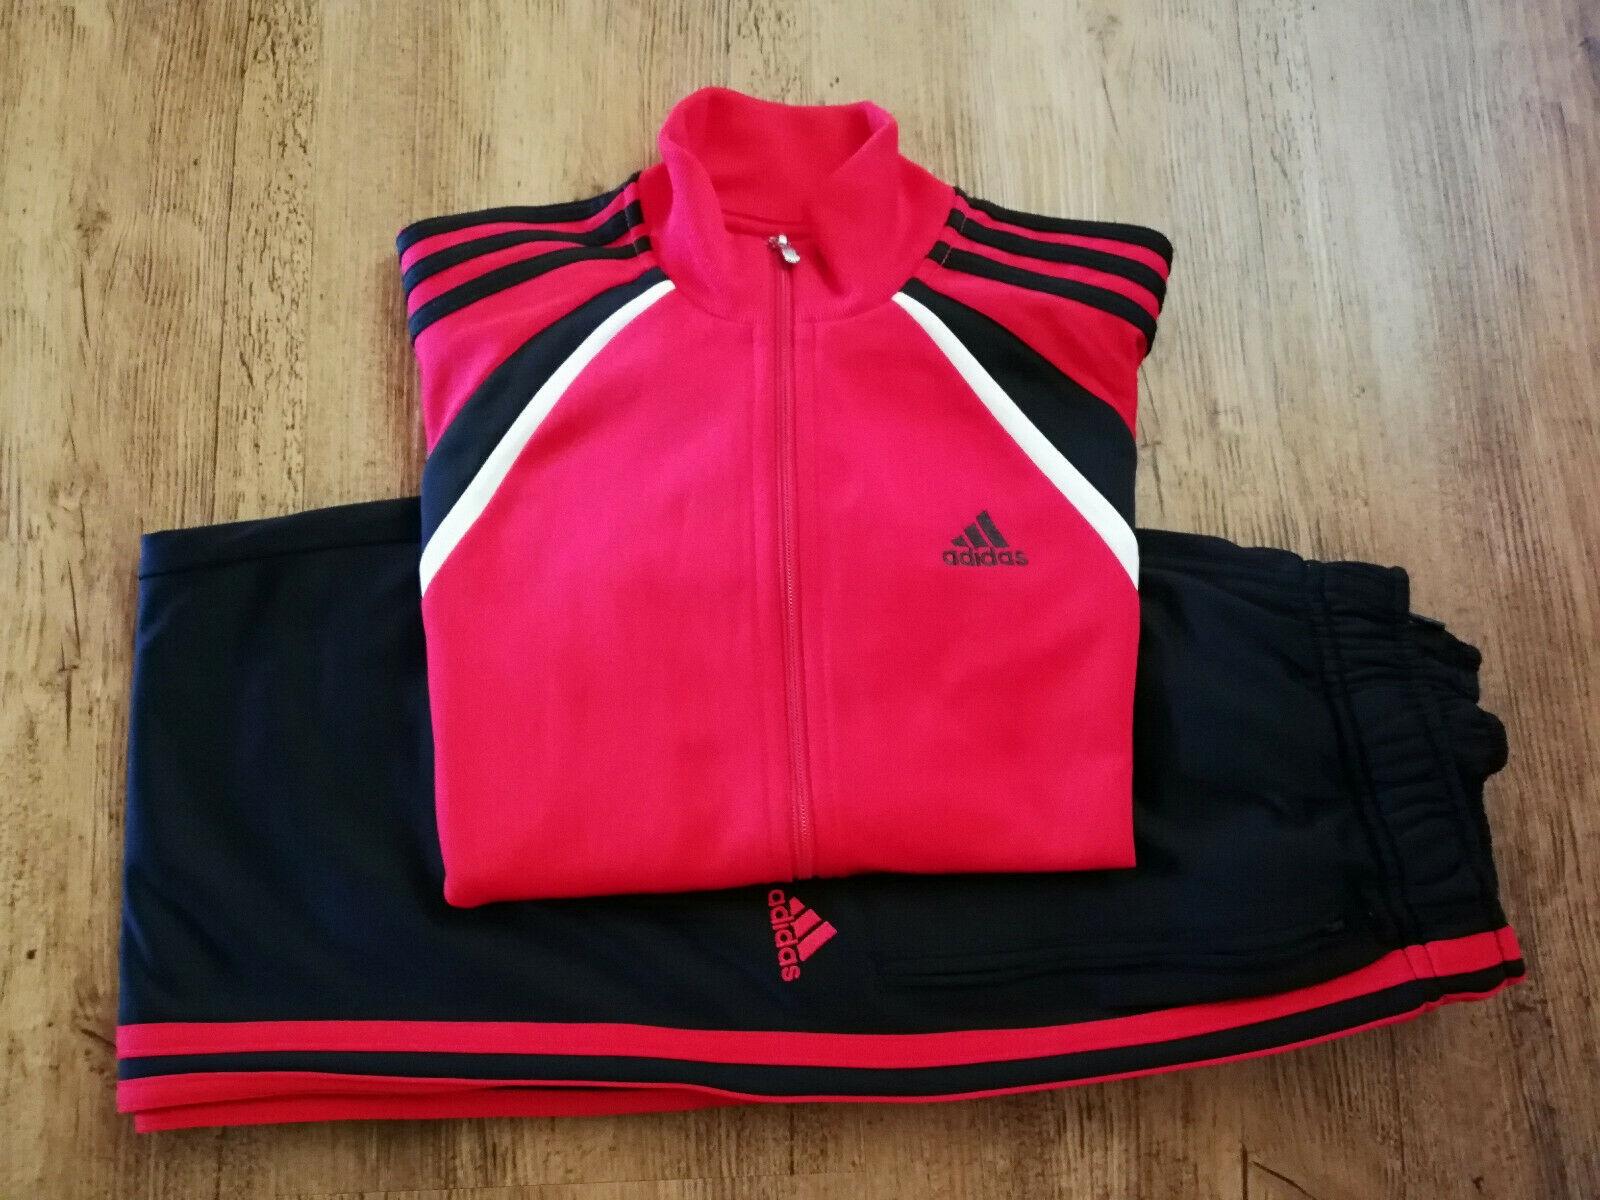 Adidas Trainingsanzug Sport Trainingsjacke Trainingshose rot schwarz NEU